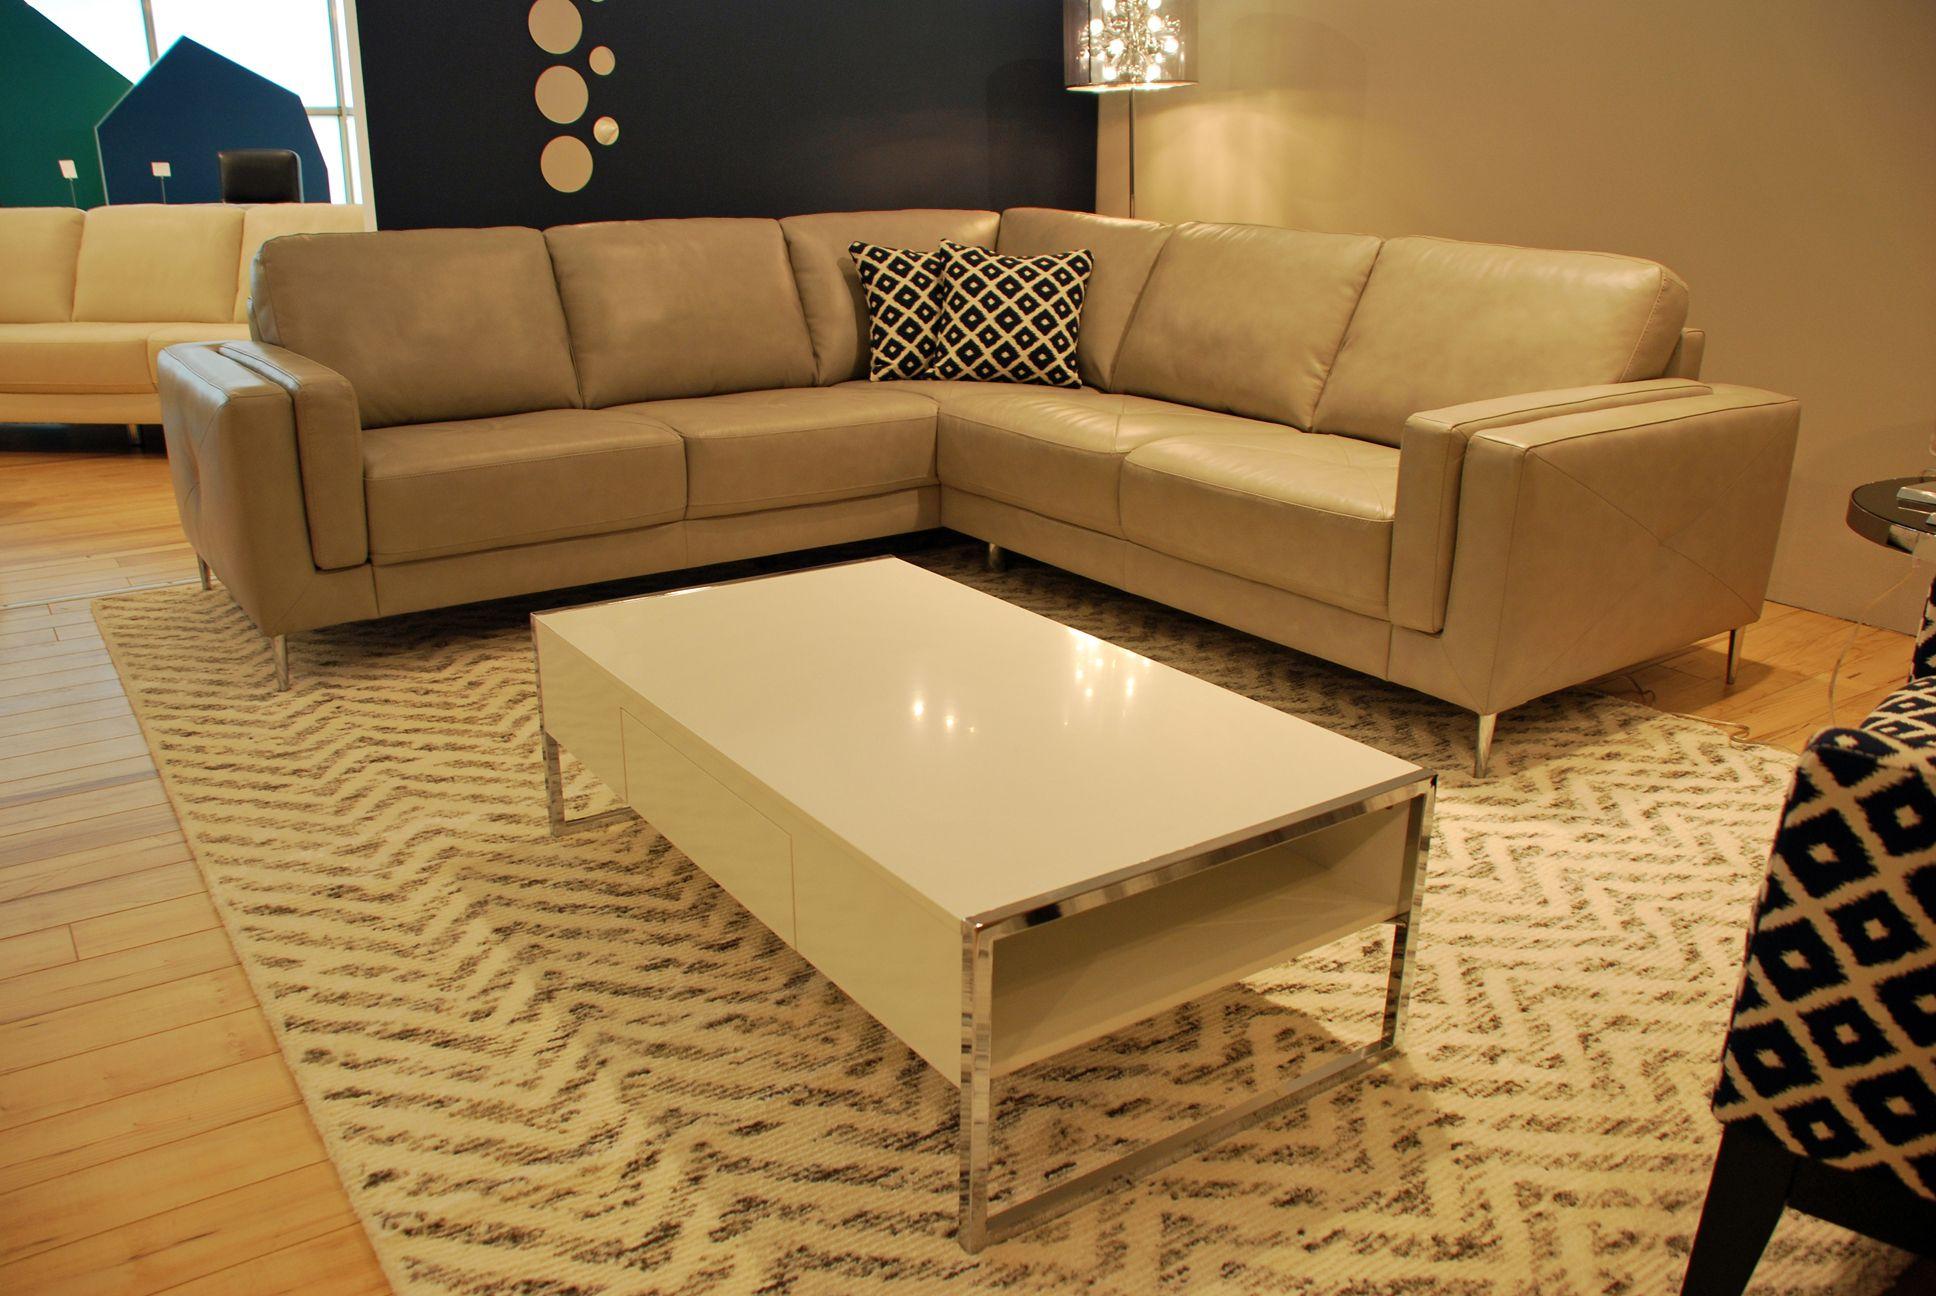 The Zuri sofa from Palliser Showroom 400 at 220Elm HPMKT